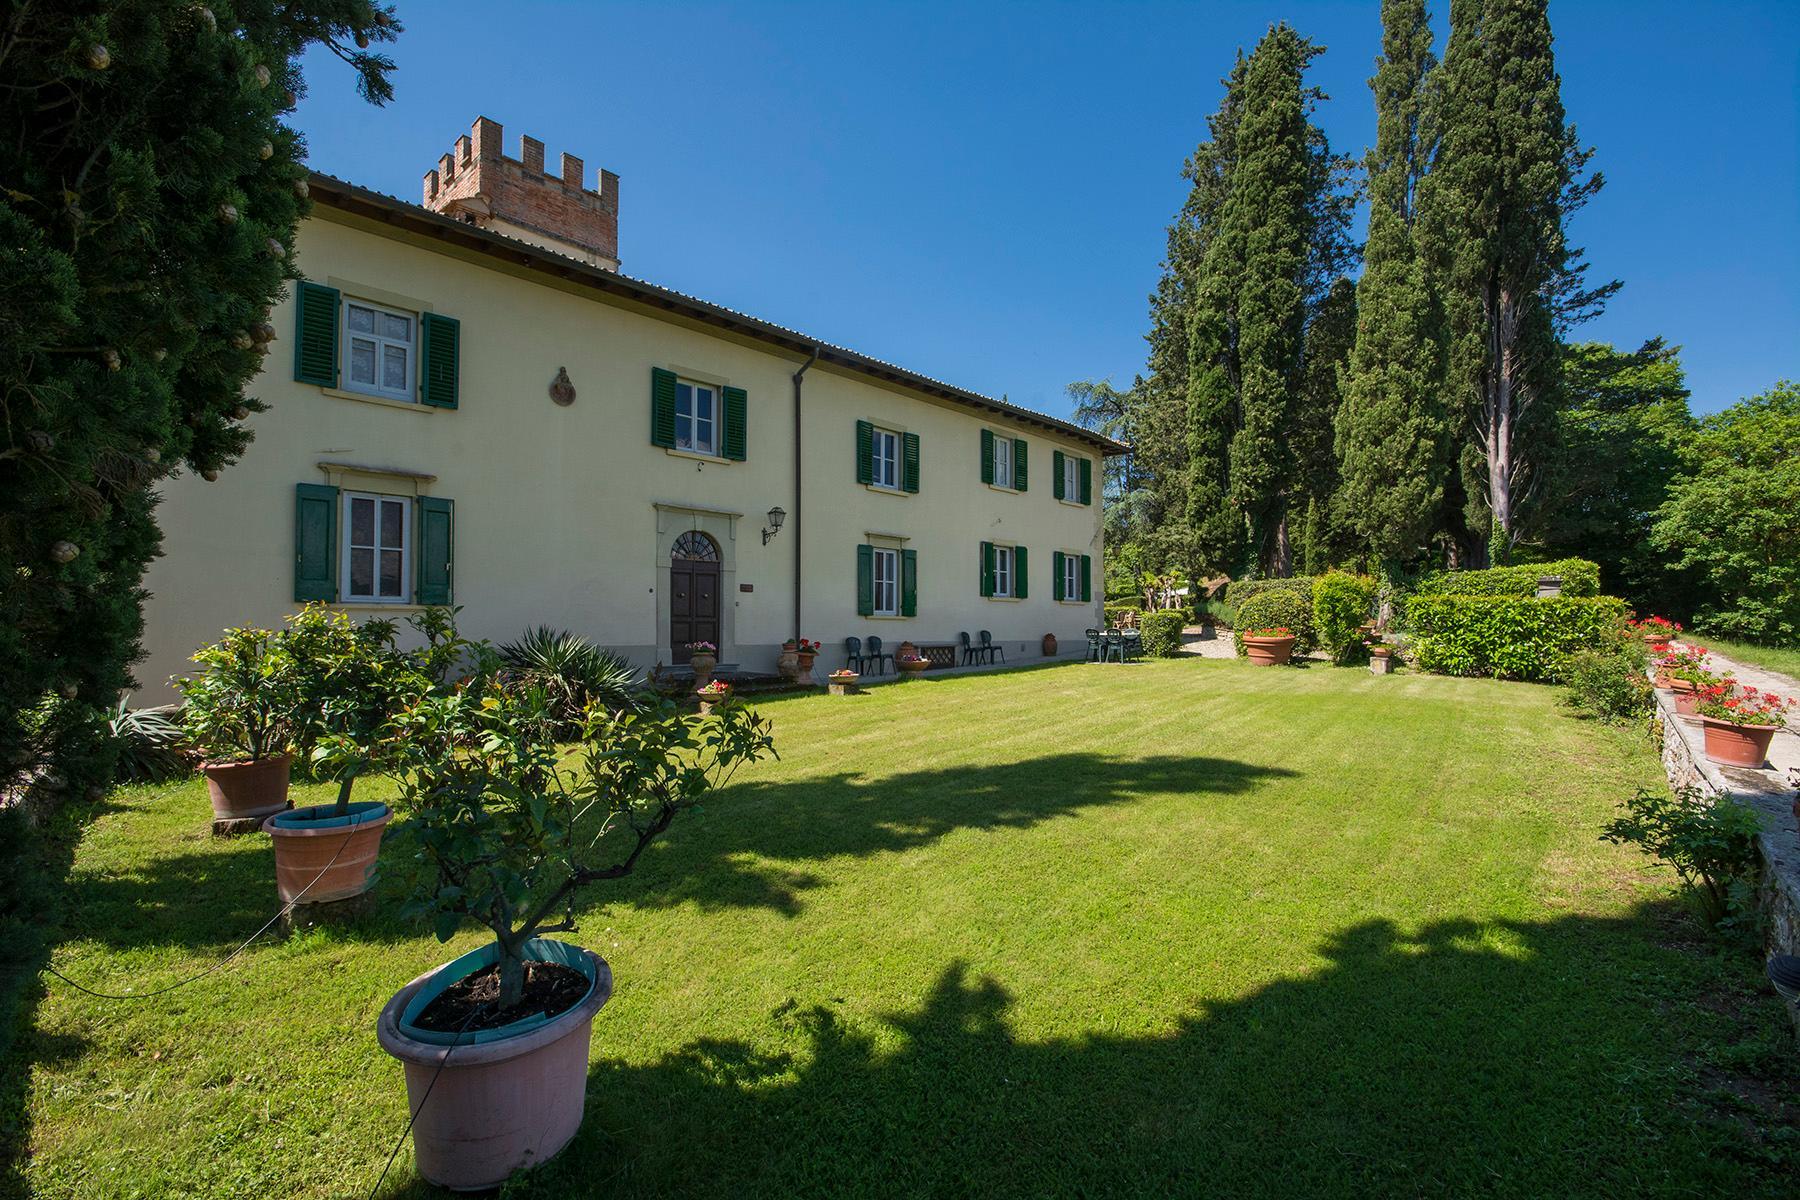 Villa charmante dans dans la Val di Sieve - 1